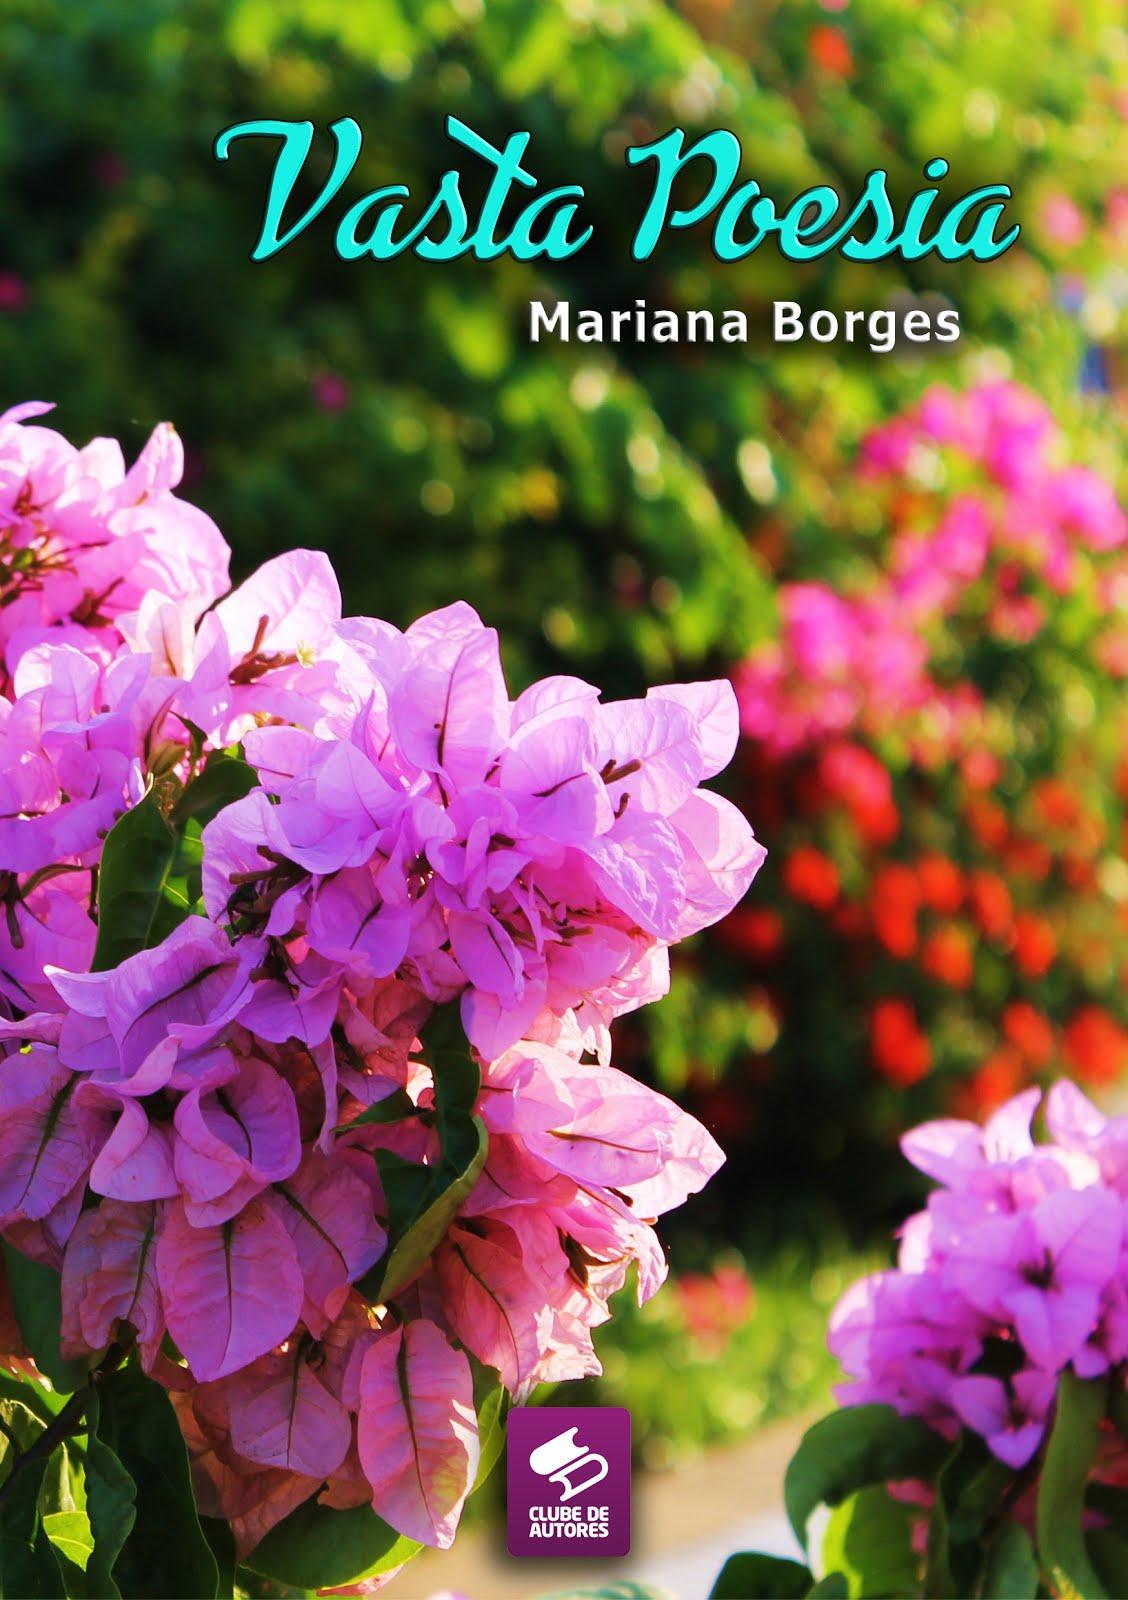 Livro de Poesias Vasta Poesia (2018) Mariana Borges